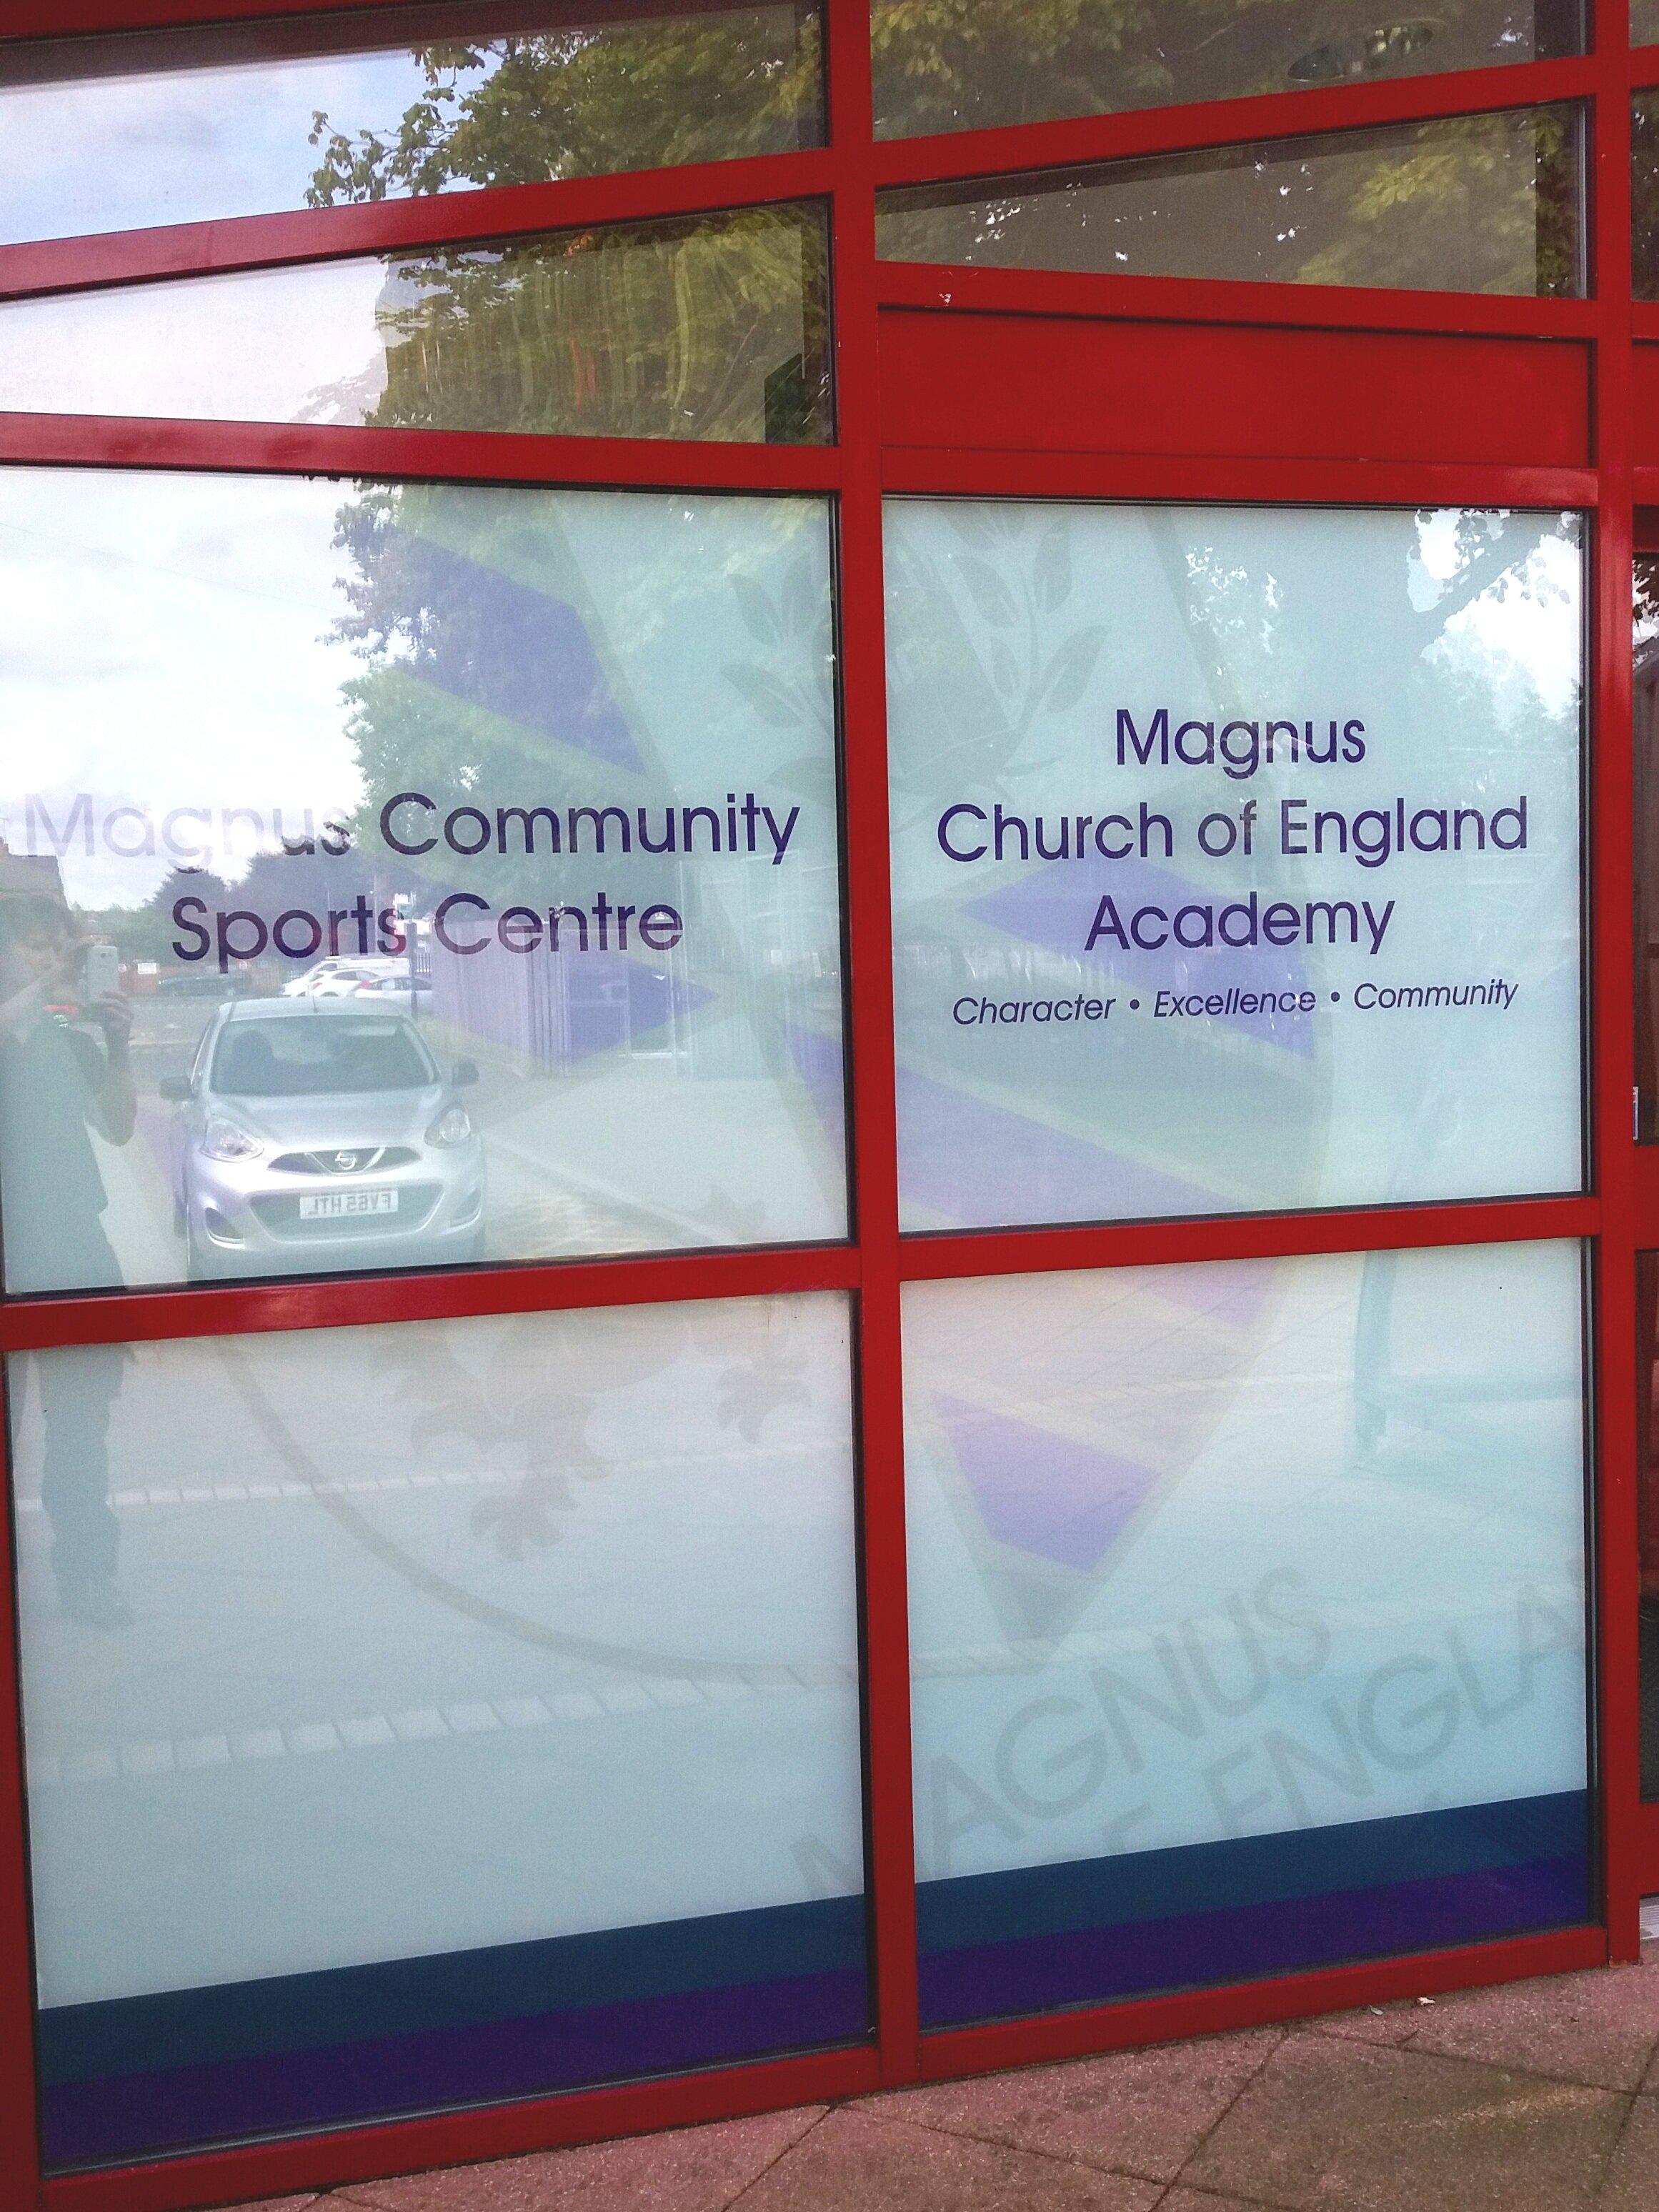 Magnus Church of England Academy